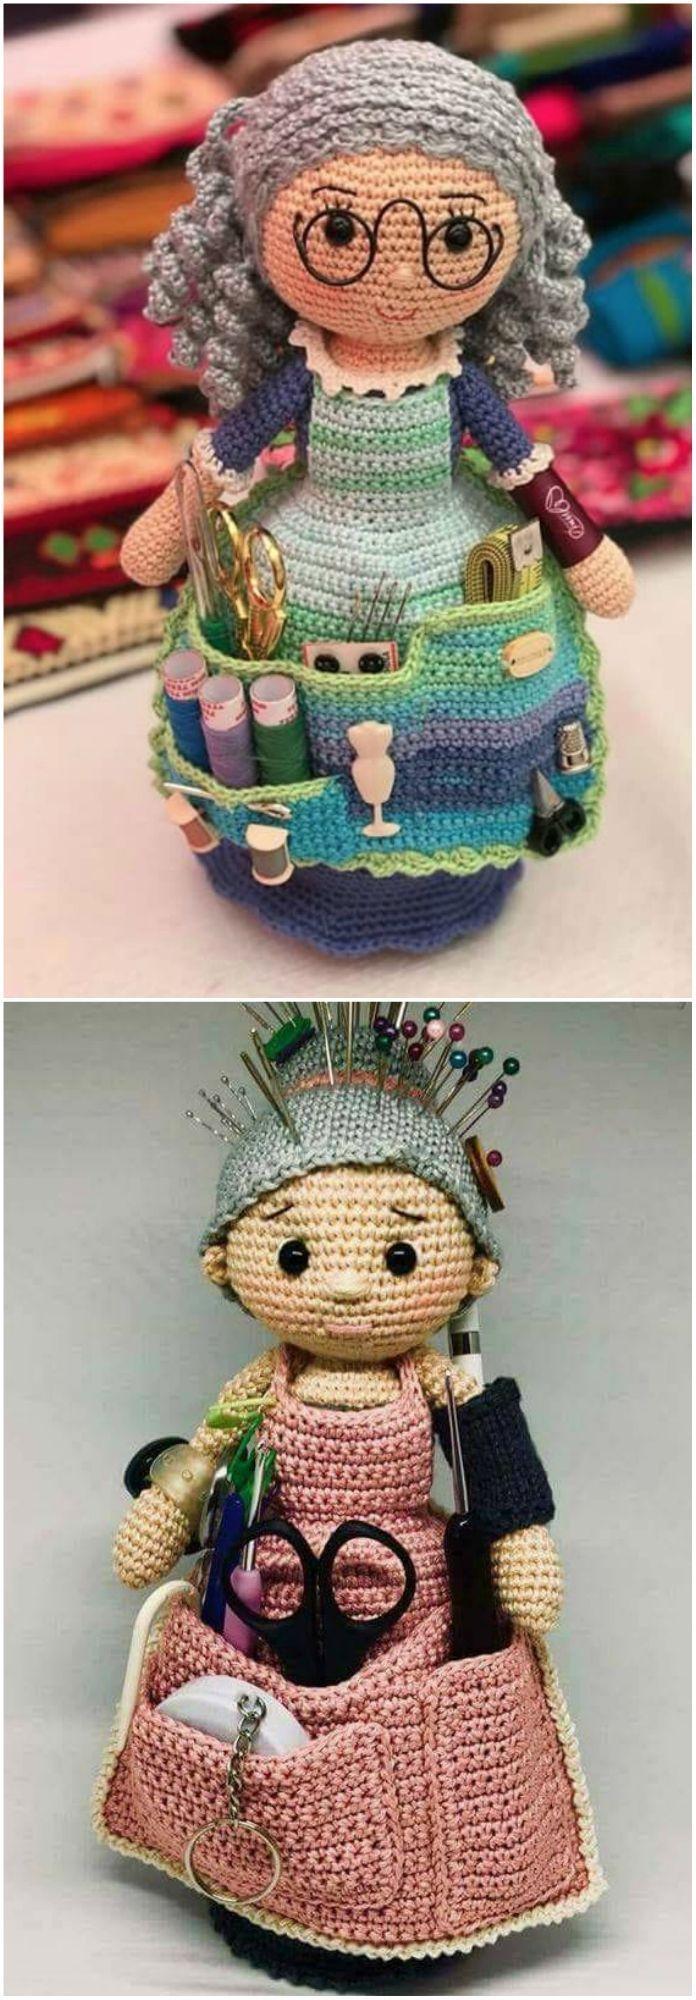 Crafter Oma Häkeln Puppe Kostenlose Muster - #Crafter #häkeln #kostenlose #muster #Oma #Puppe #amigurumifreepattern